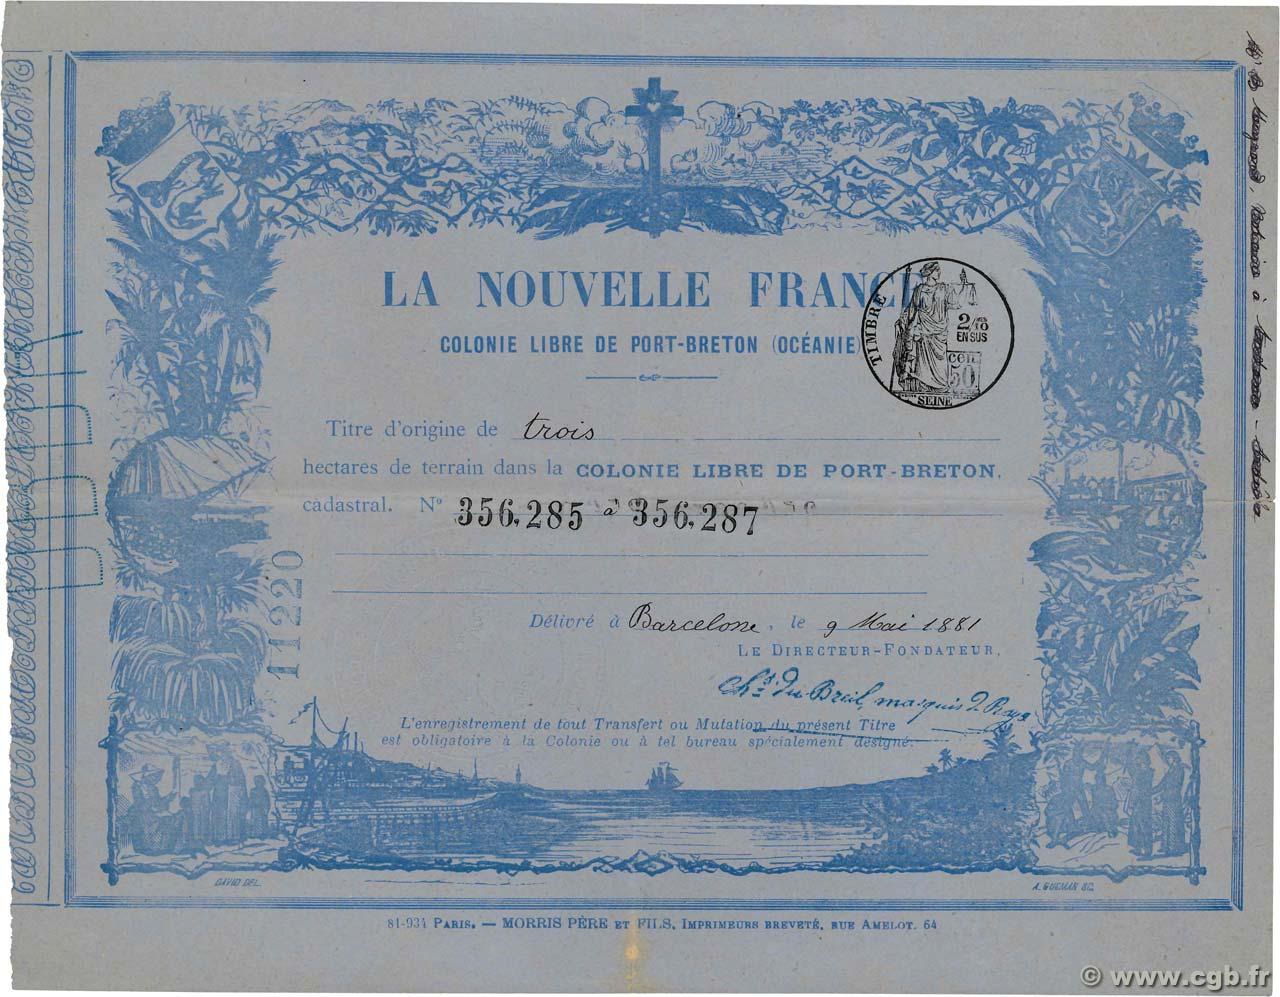 3 Hectares Oceania Port Breton 1881 Km 530 4170319 Banknotes